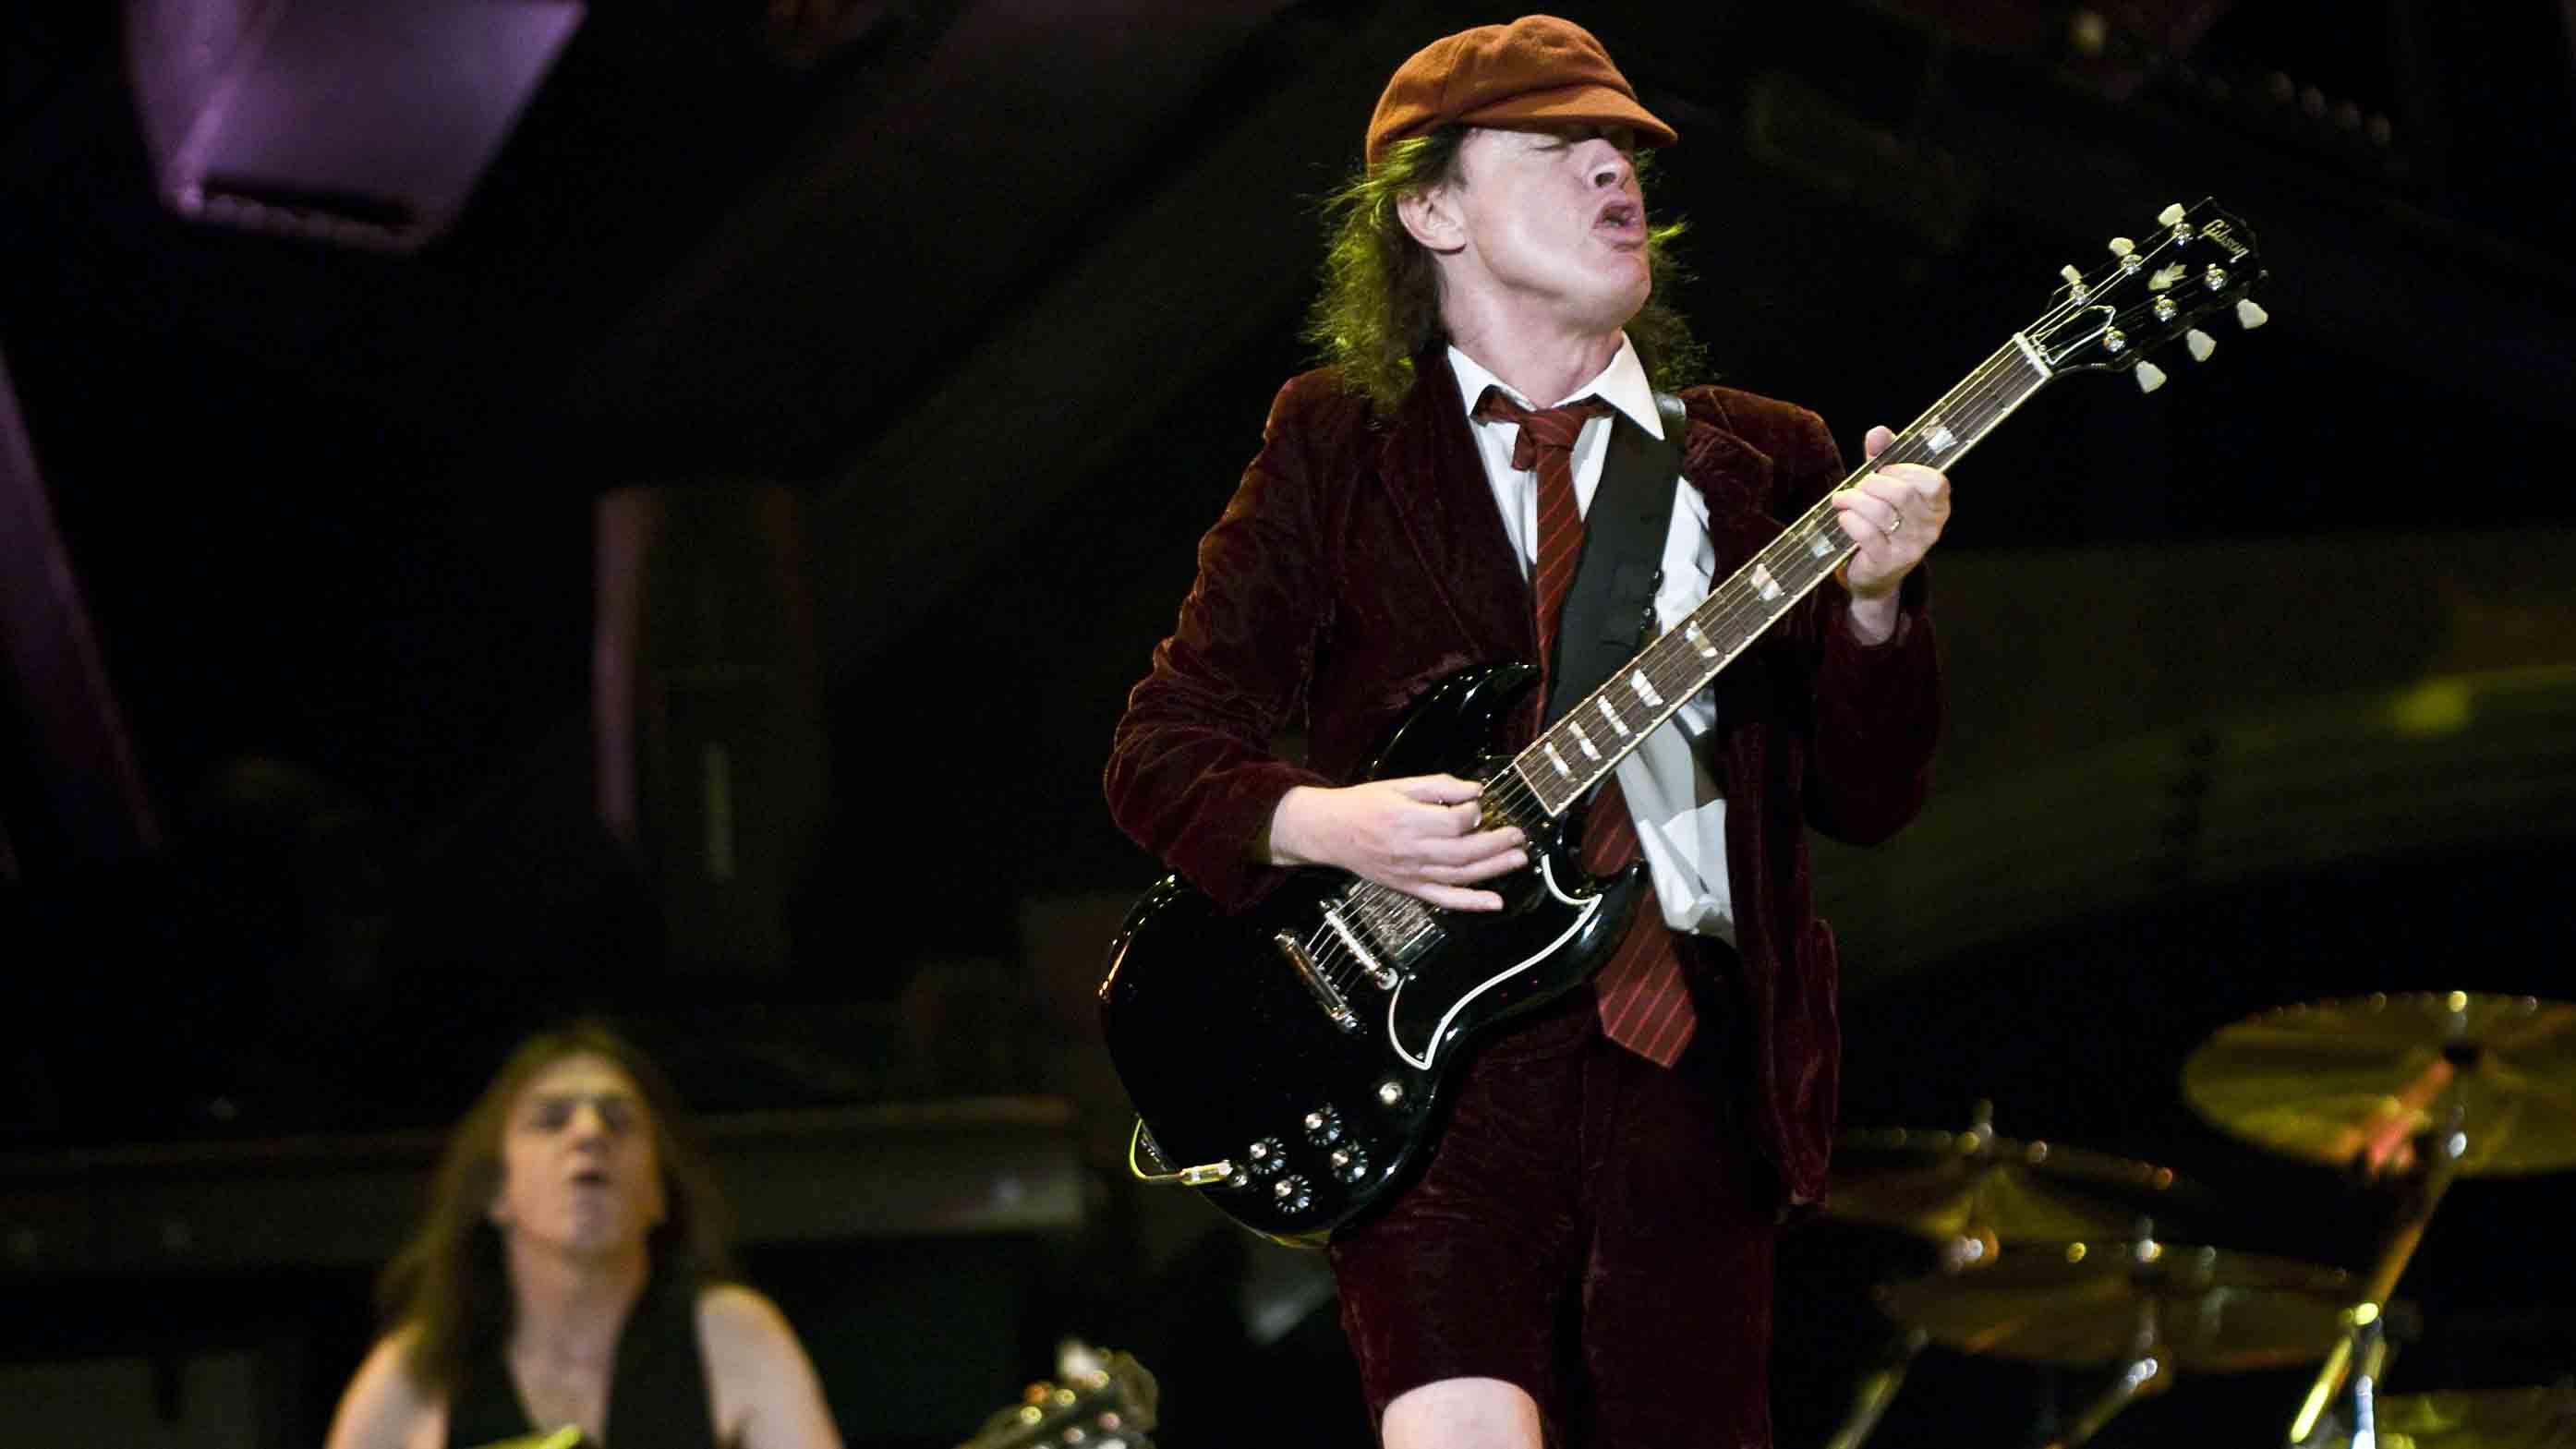 How to play guitar like AC/DC